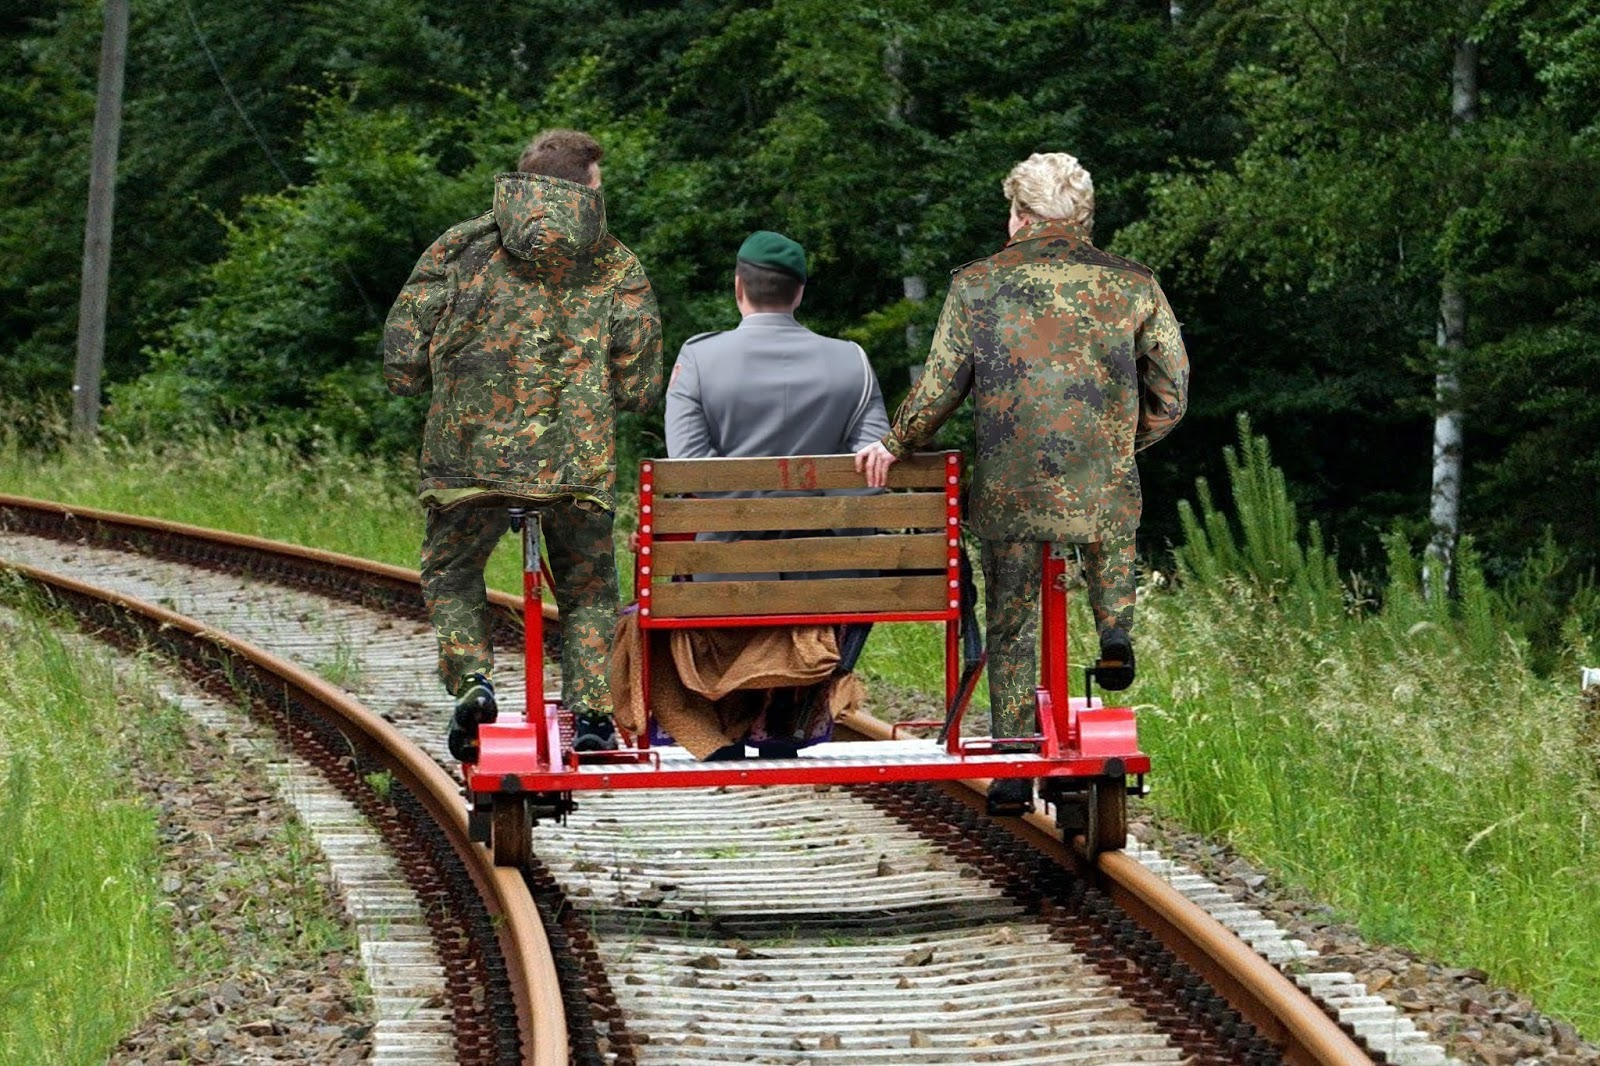 soldaten zug fahren